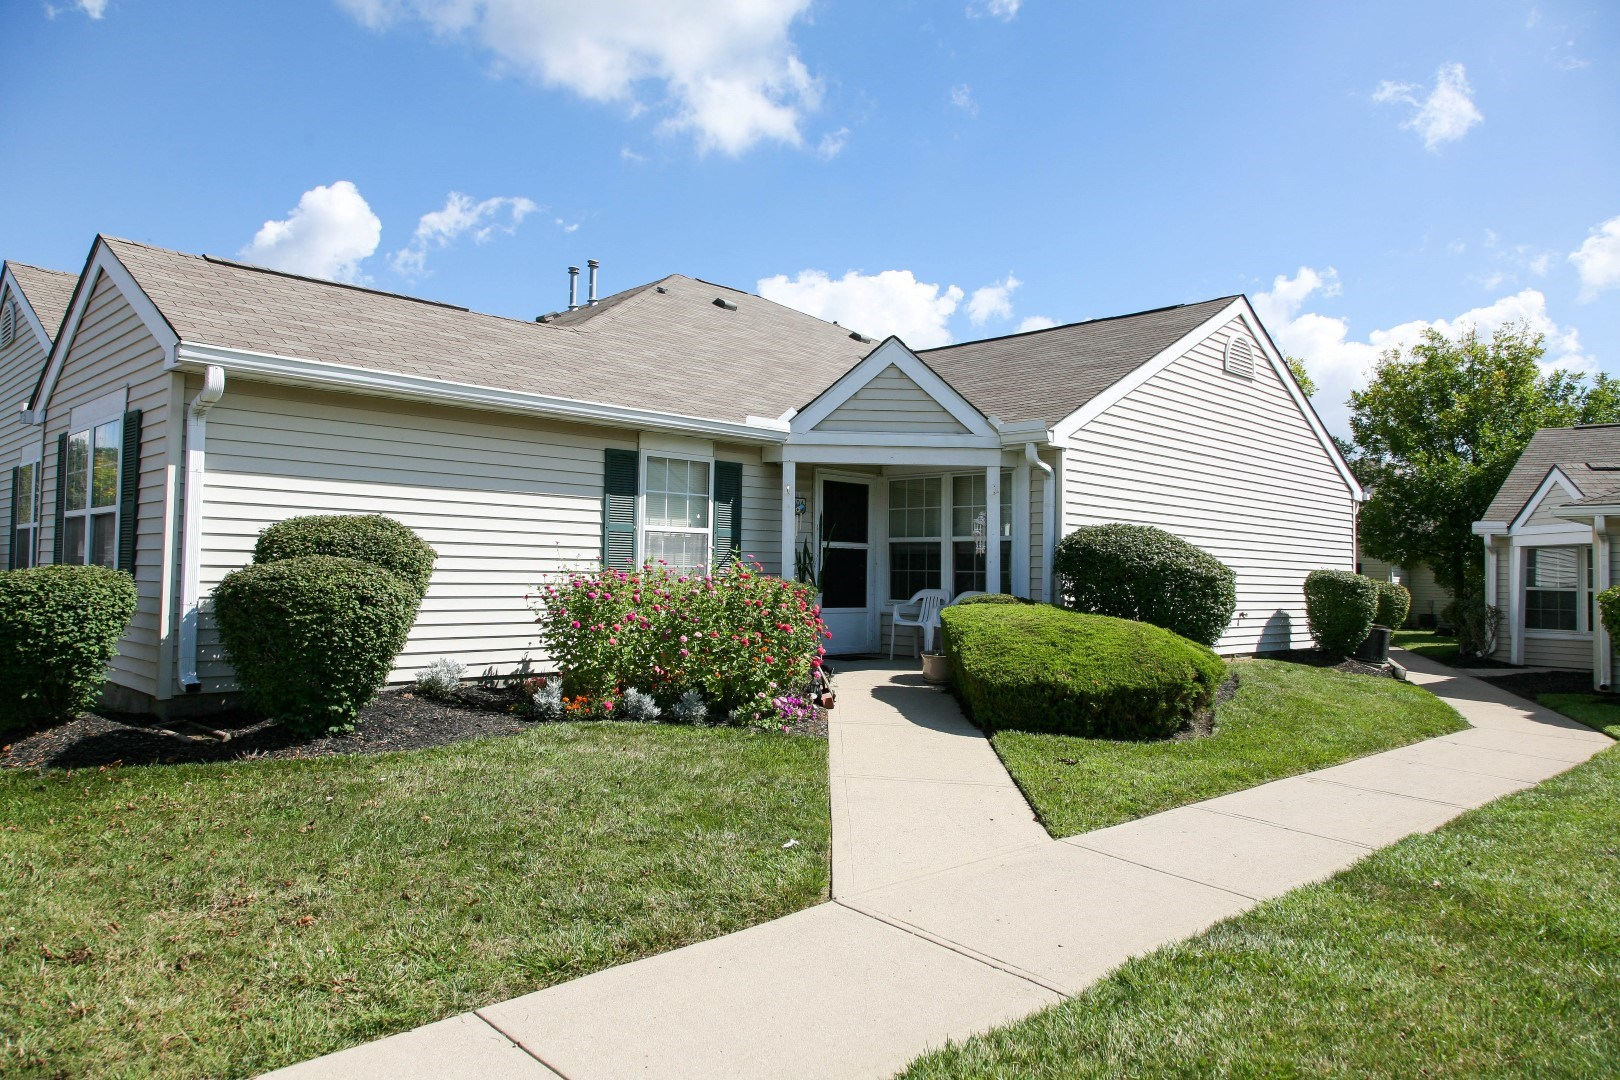 Shiloh Villas Affordable Apartments